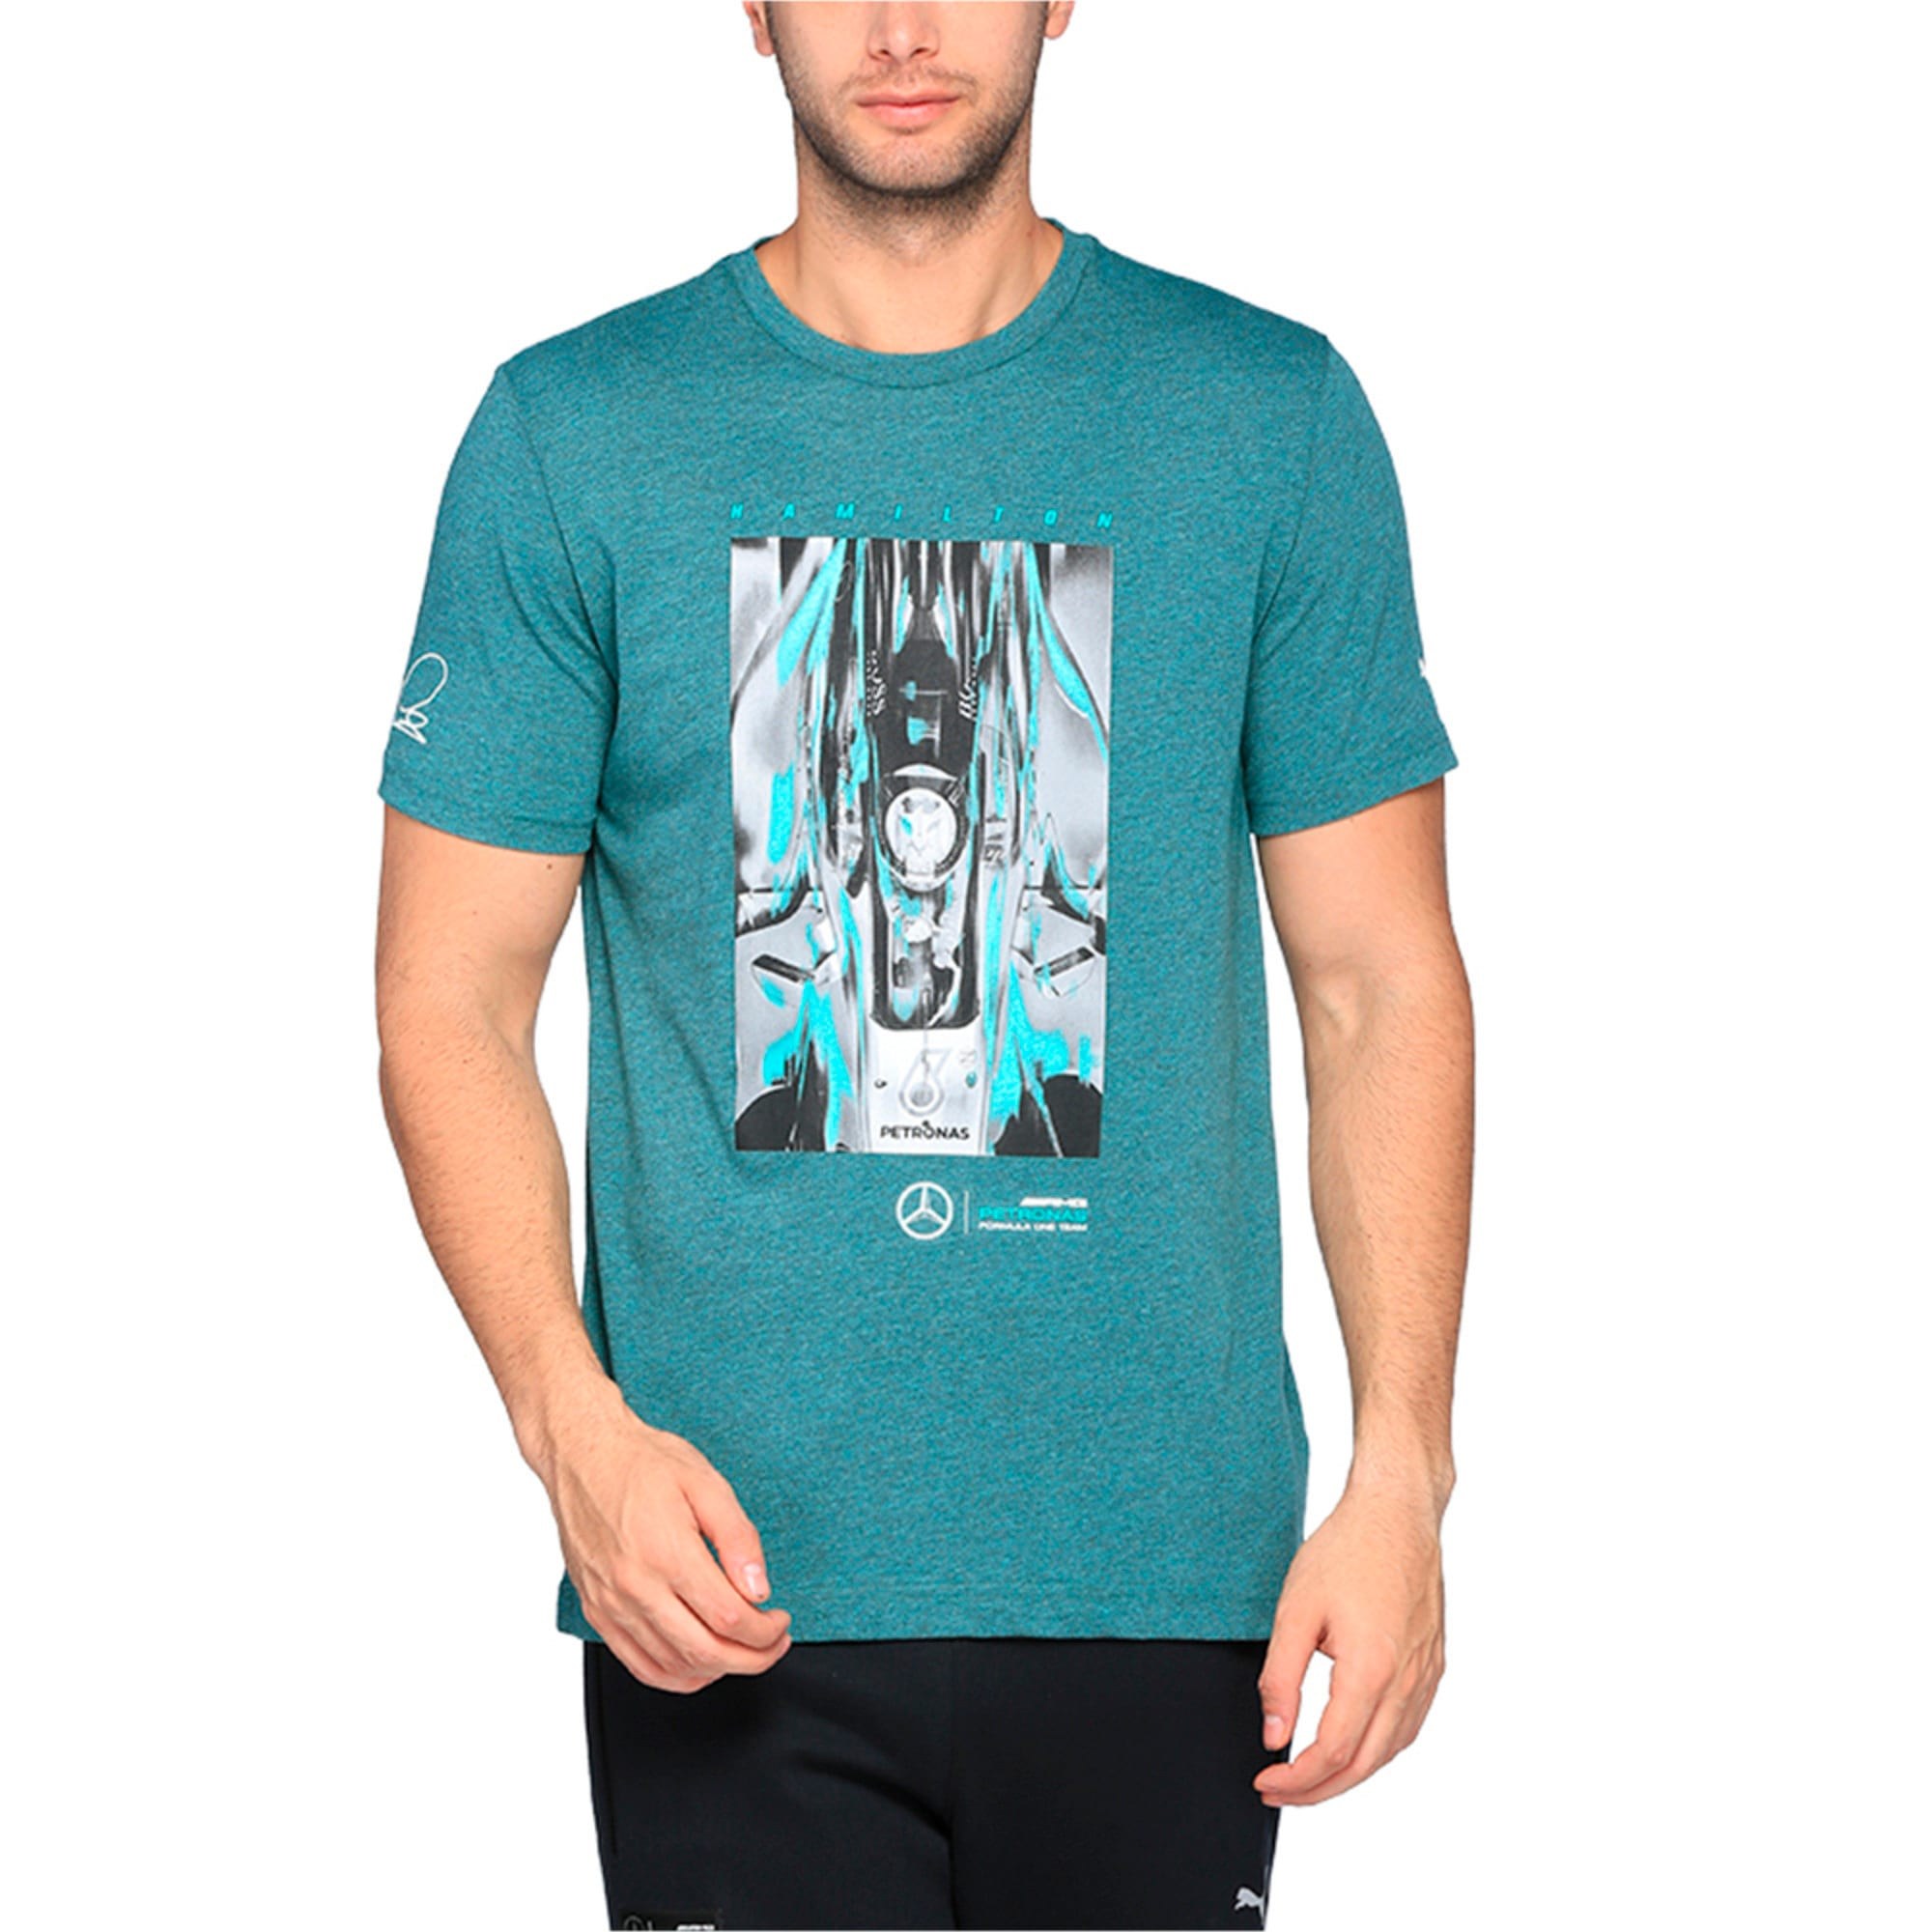 Thumbnail 1 of MERCEDES AMG PETRONAS Men's Driver T-Shirt, Deep Teal Heather, medium-IND